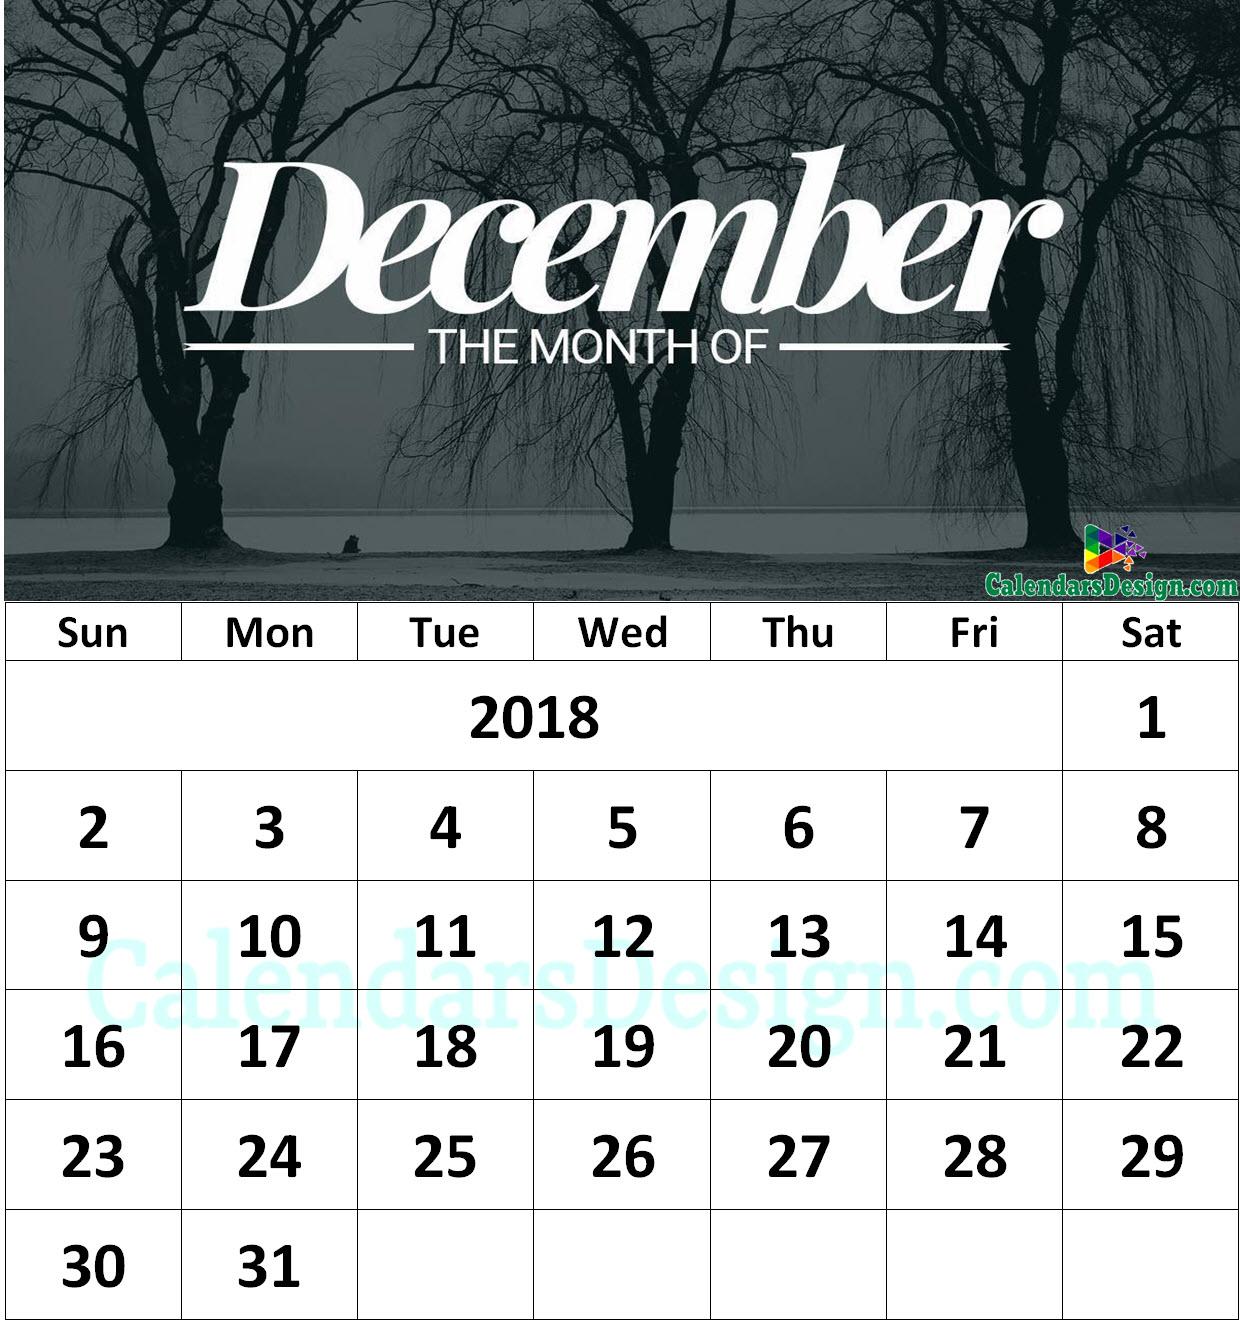 December 2018 Calendar Tumblr Free 2019 Printable Calendar